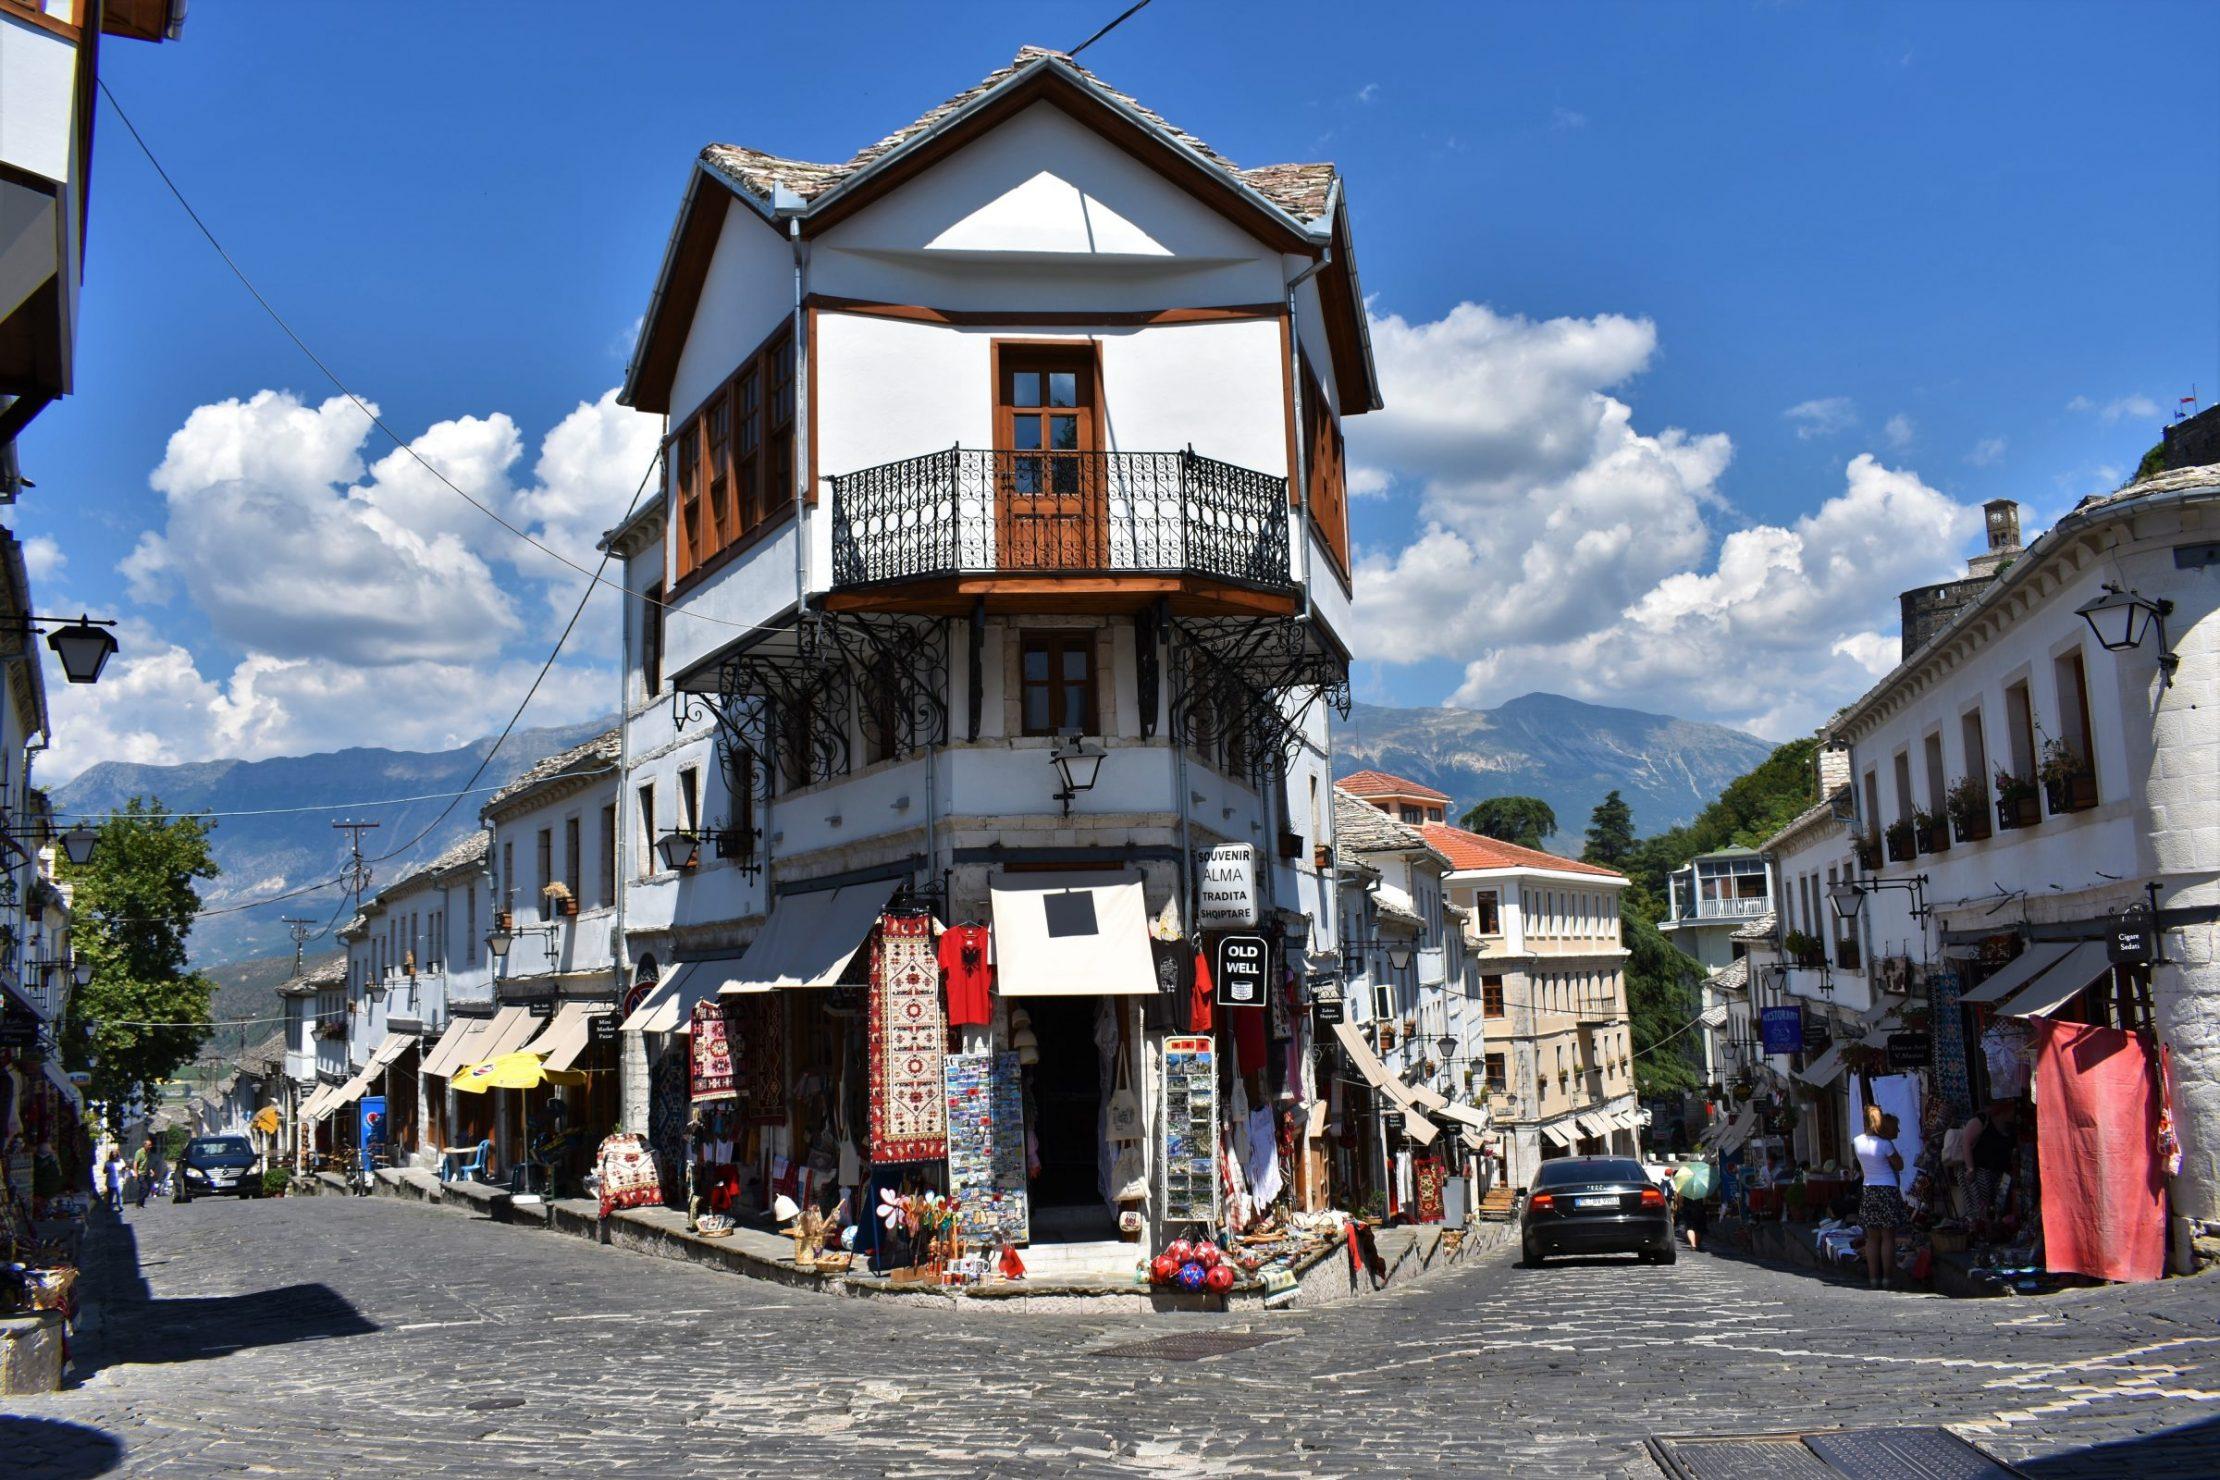 Unique Ottoman architecture of Gjirokastra